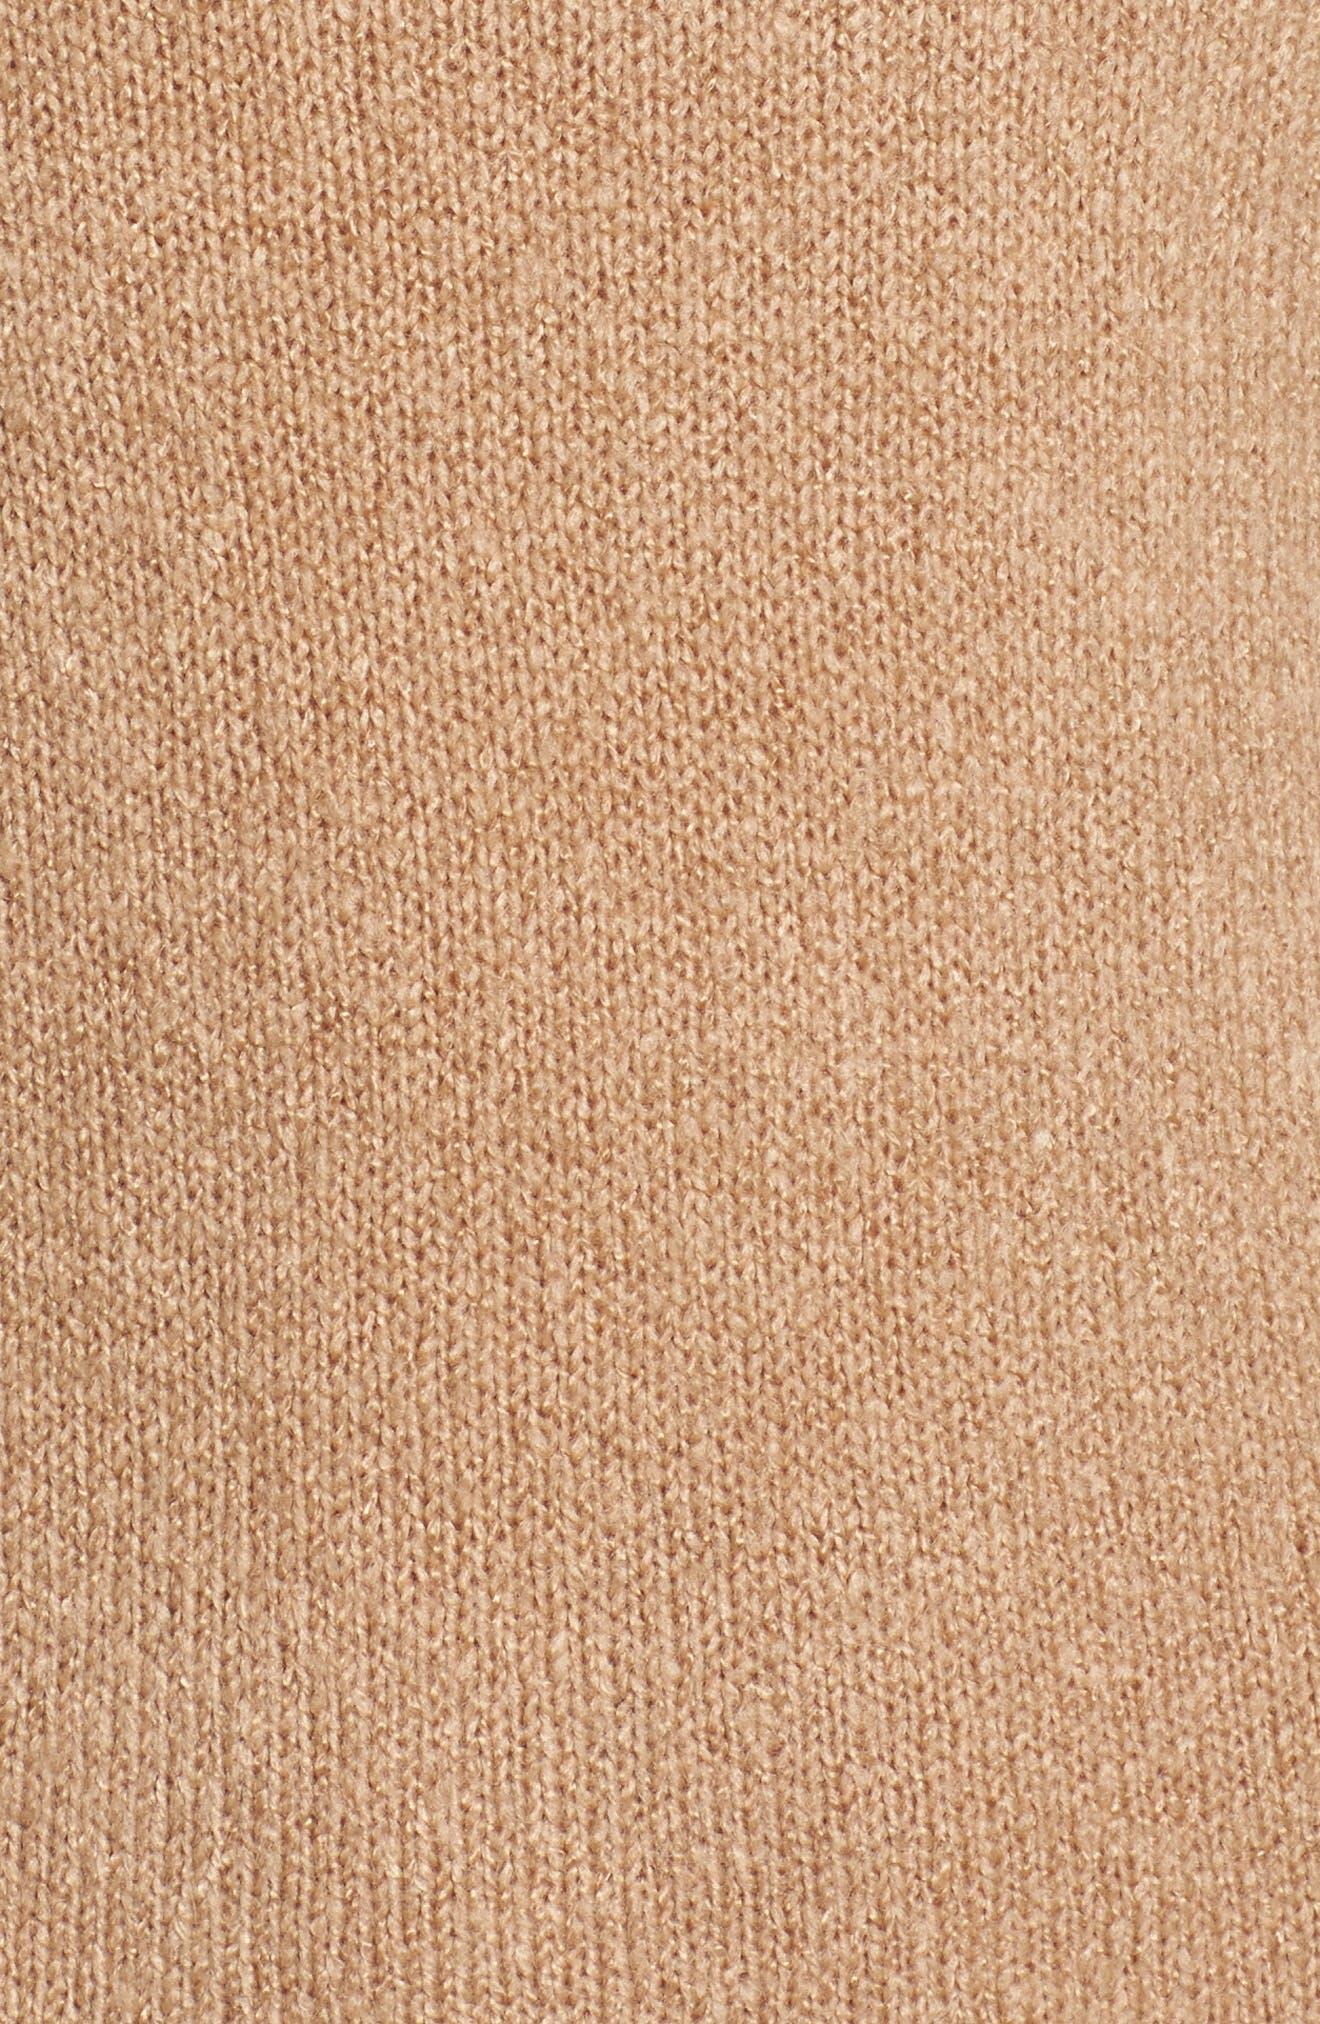 Bell Sleeve Knit Dress,                             Alternate thumbnail 5, color,                             208